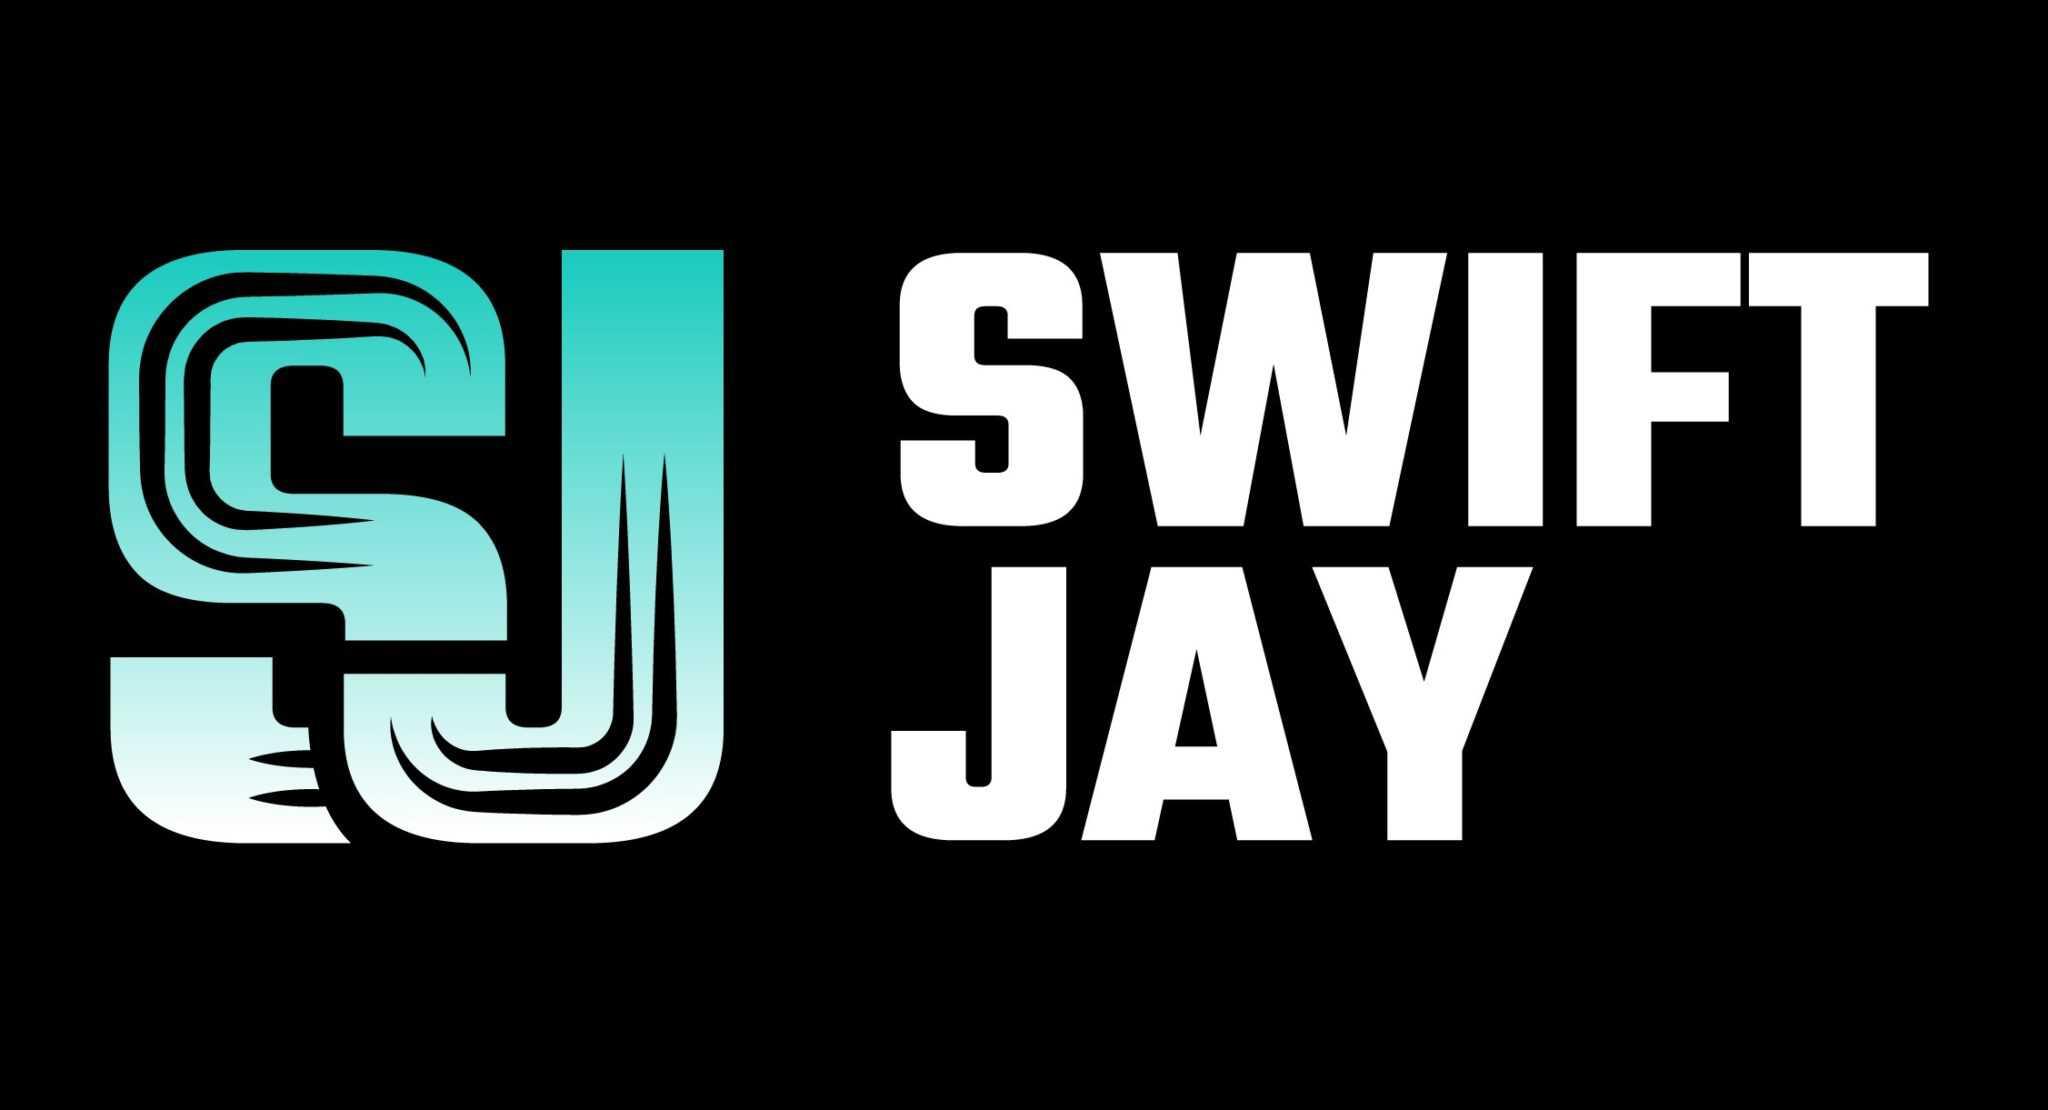 DJ Swift Jay - djlogodesign.co.uk logo